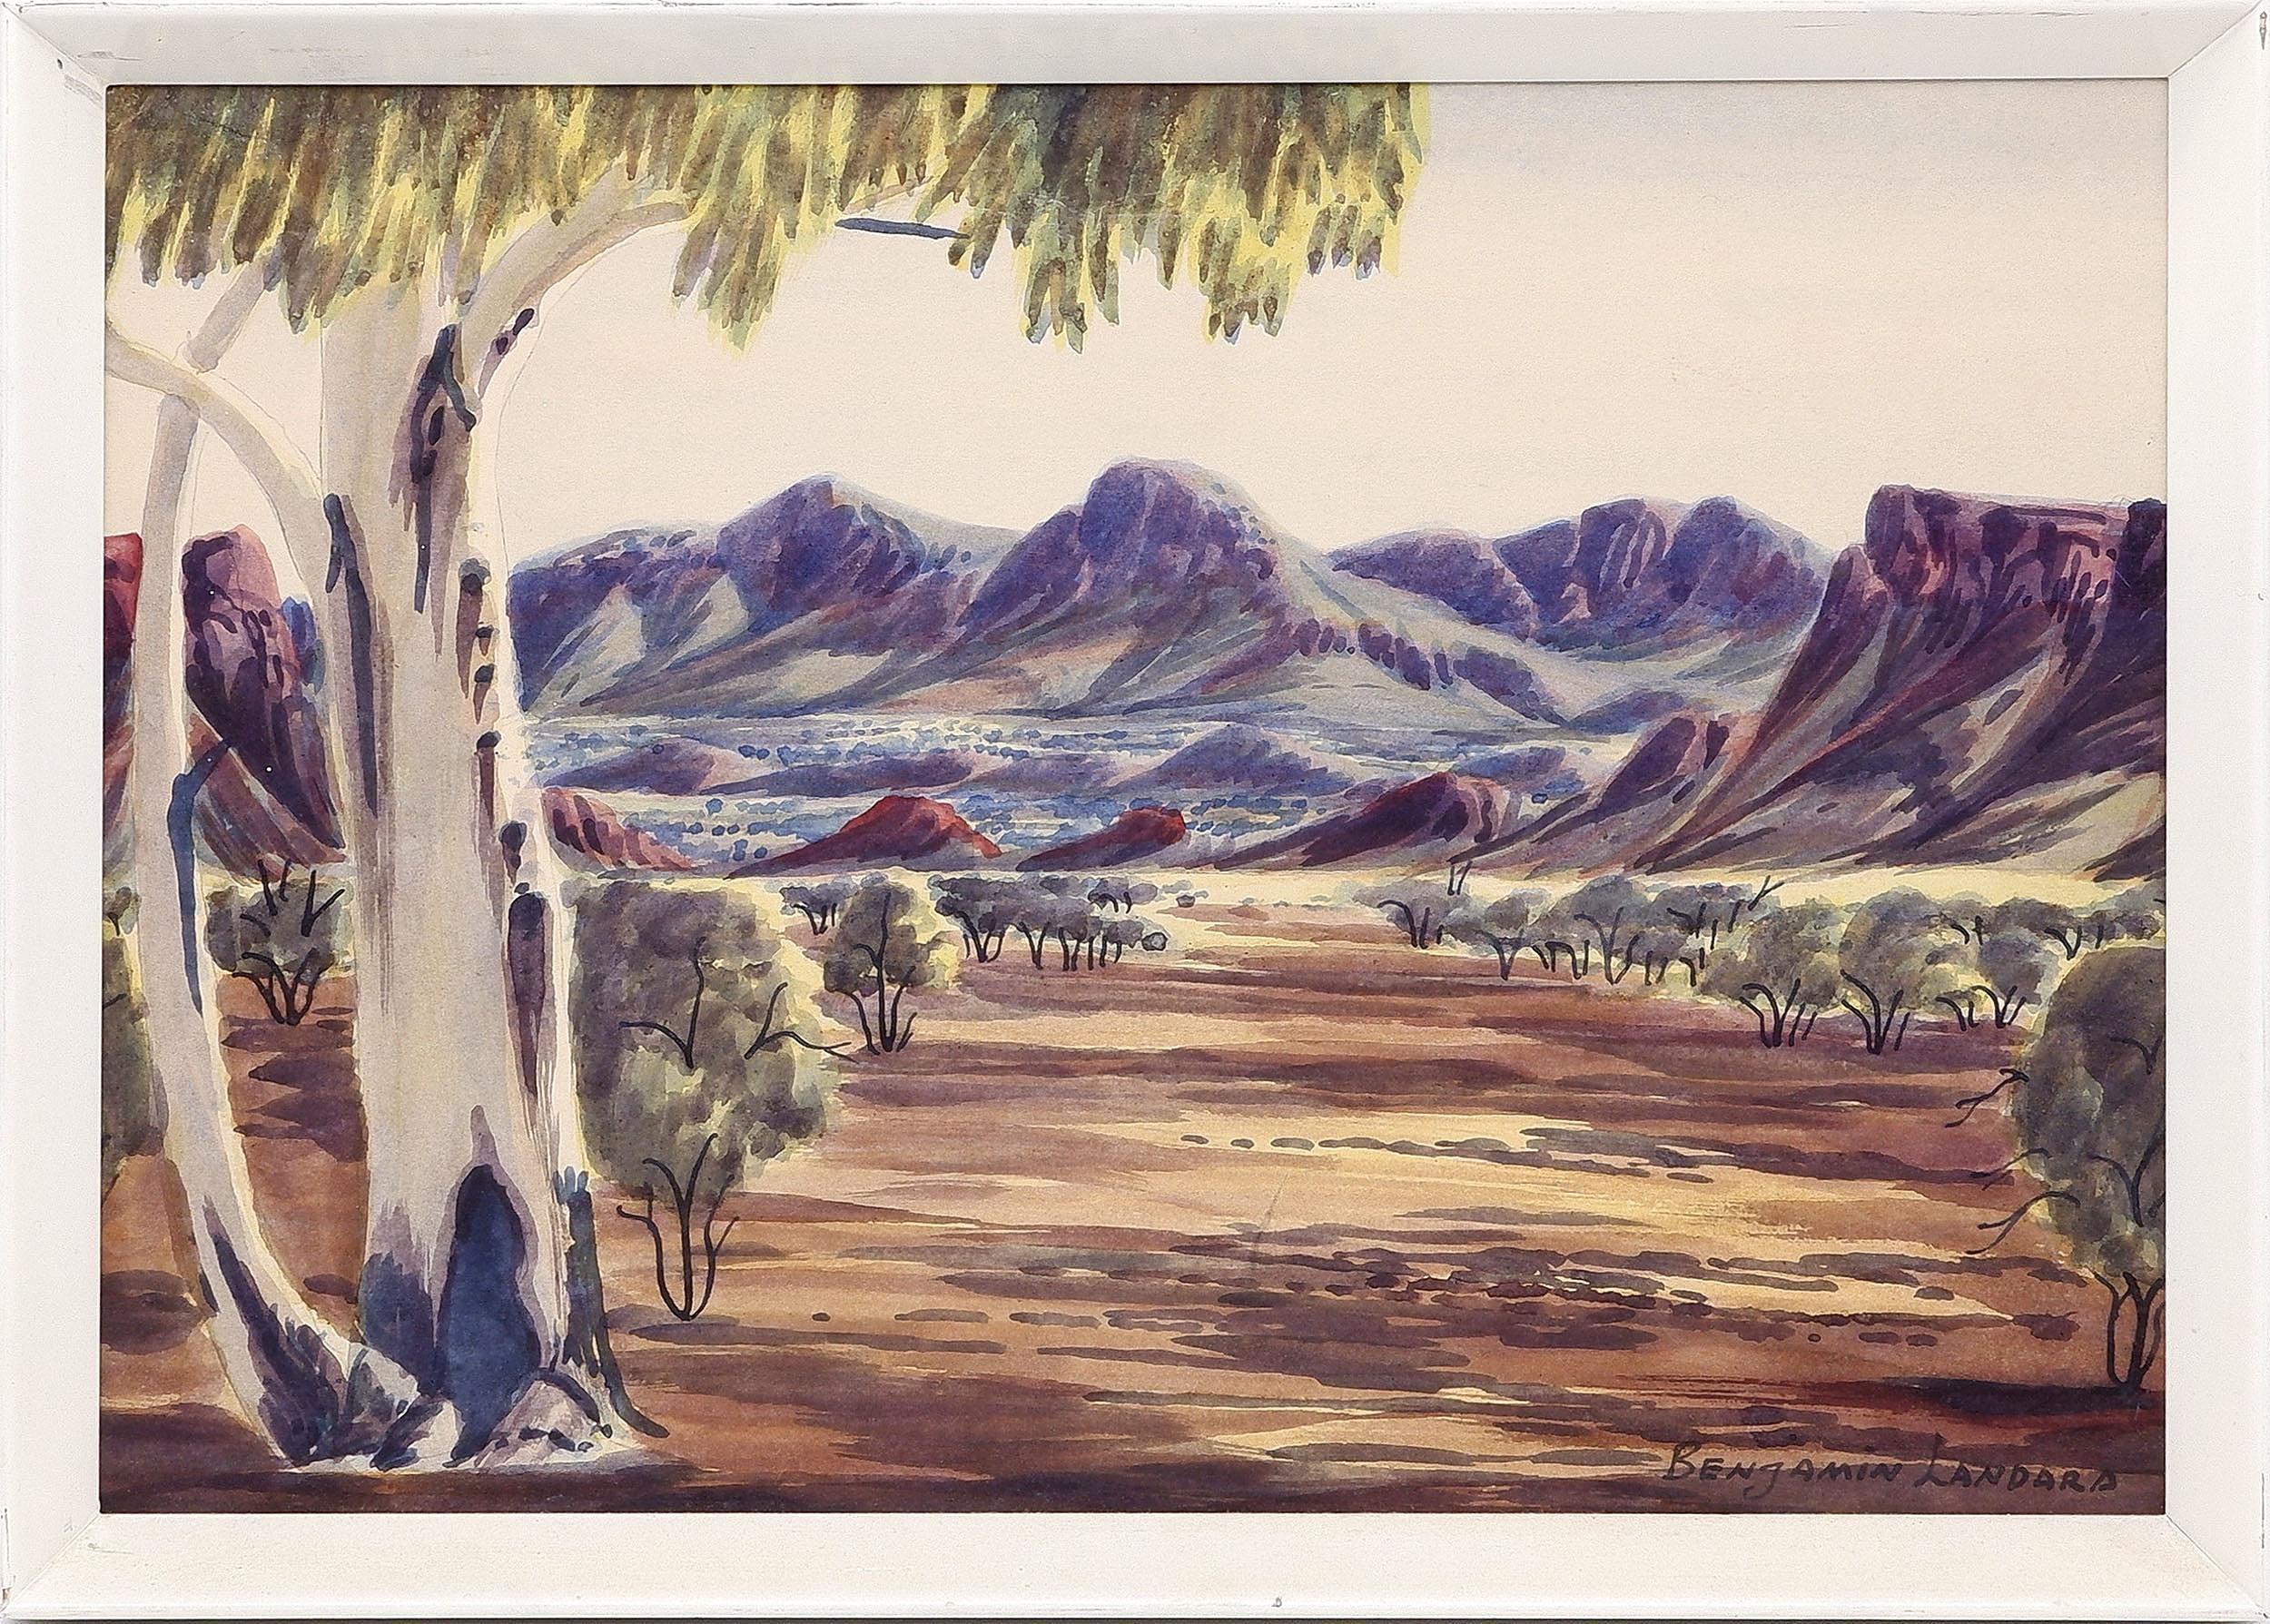 'Benjamin Landara (1921-85) Haasts Bluff, Watercolour'